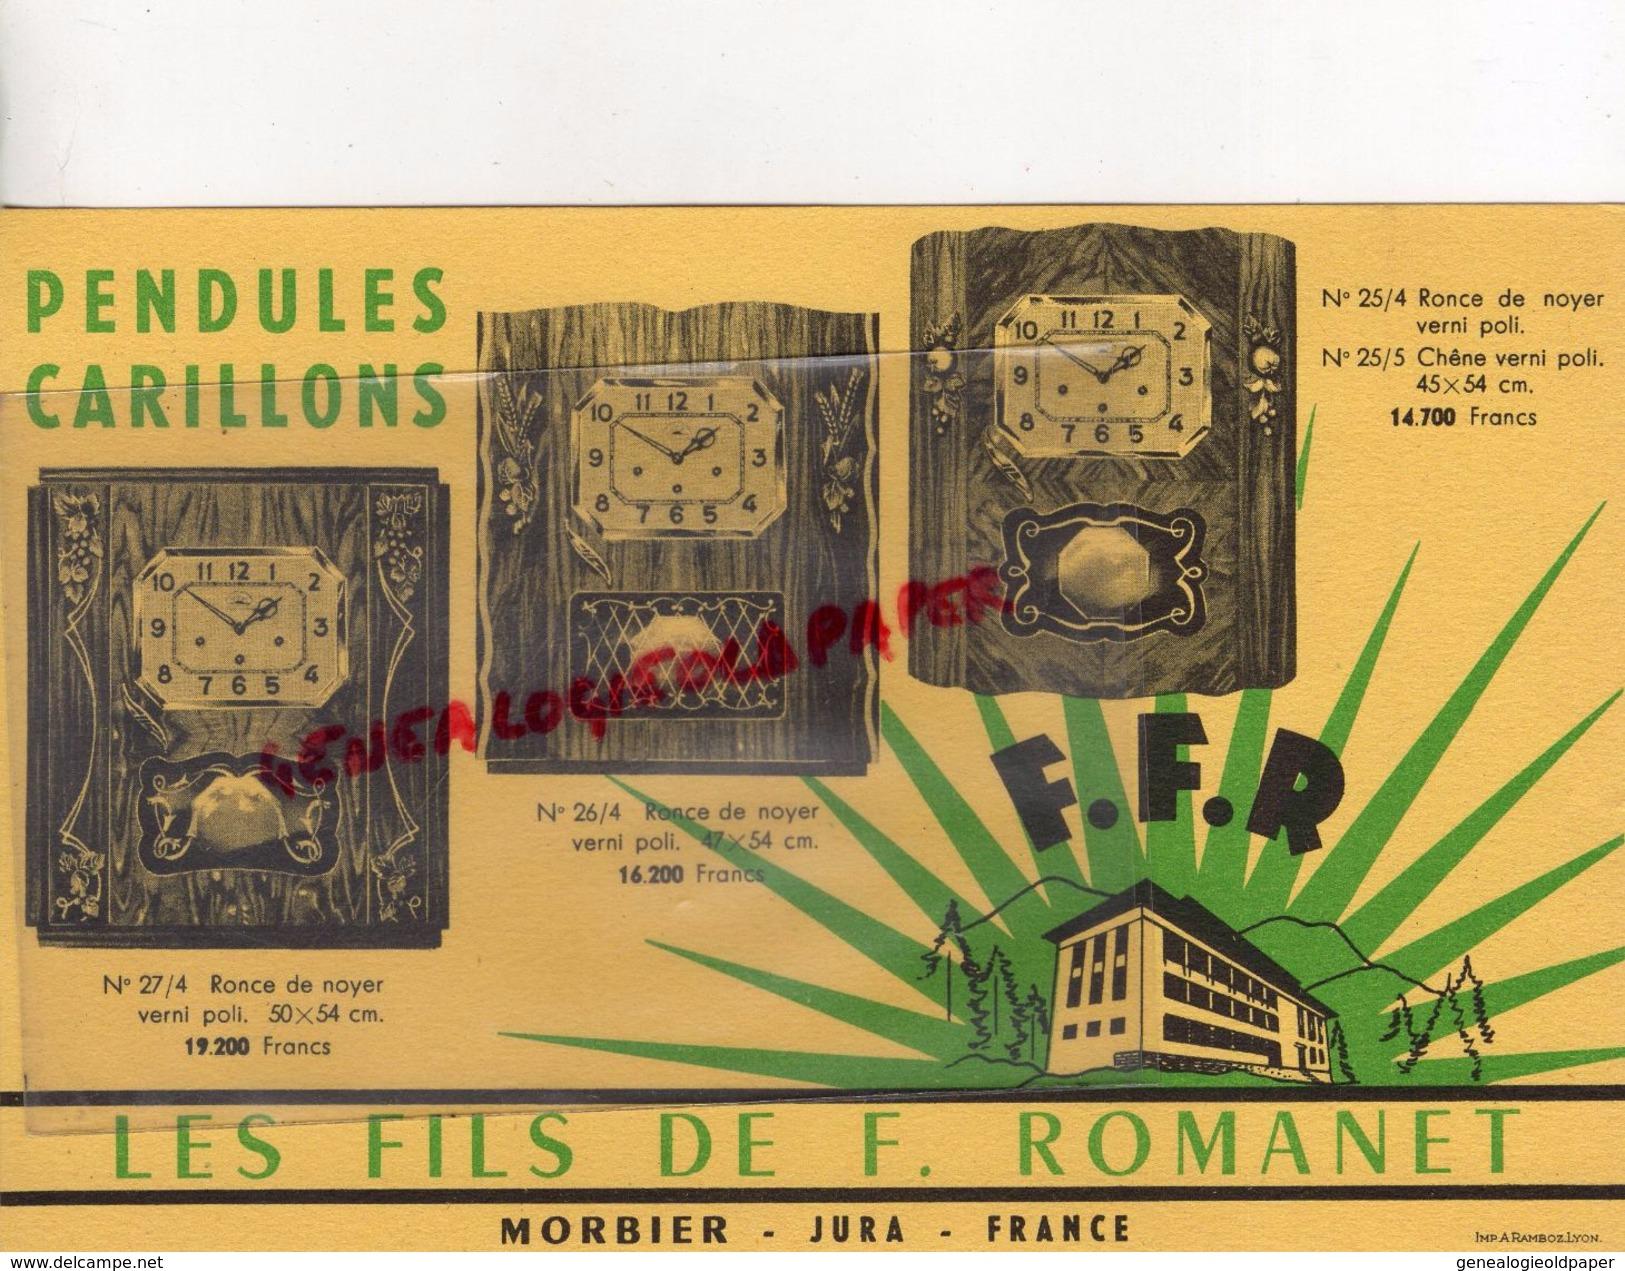 39- MORBIER- JURA- RARE BUVARD LES FILS DE F. ROMANET- HORLOGERIE -PENDULES CARILLONS-RONCE DE NOYER- HORLOGER - H